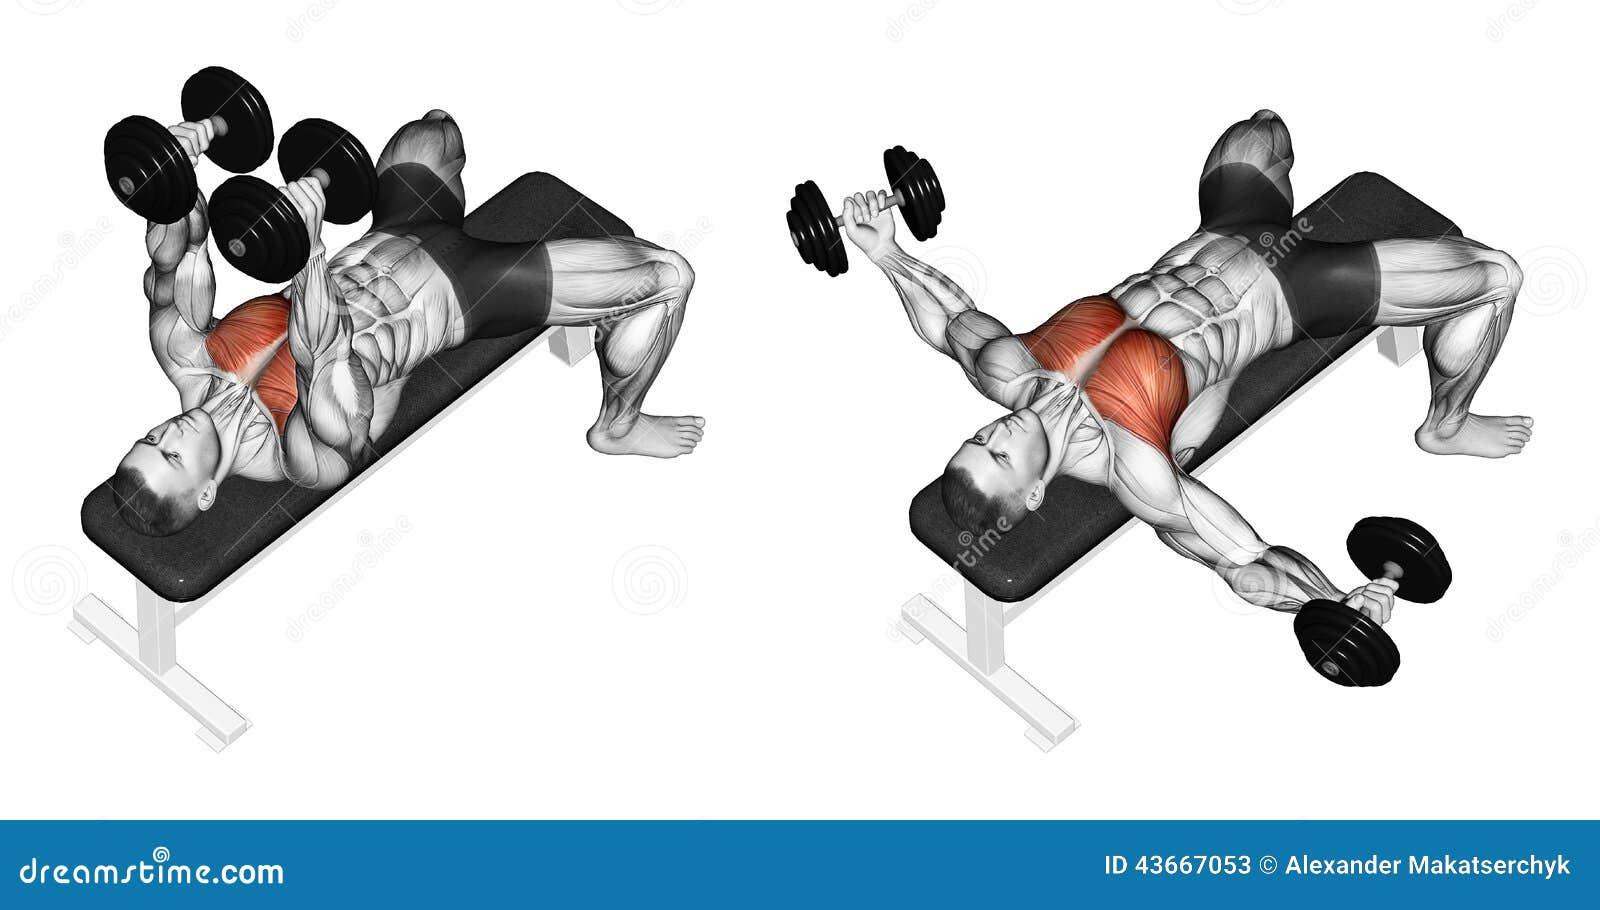 Exercising Breeding Dumbbells Lying Stock Illustration